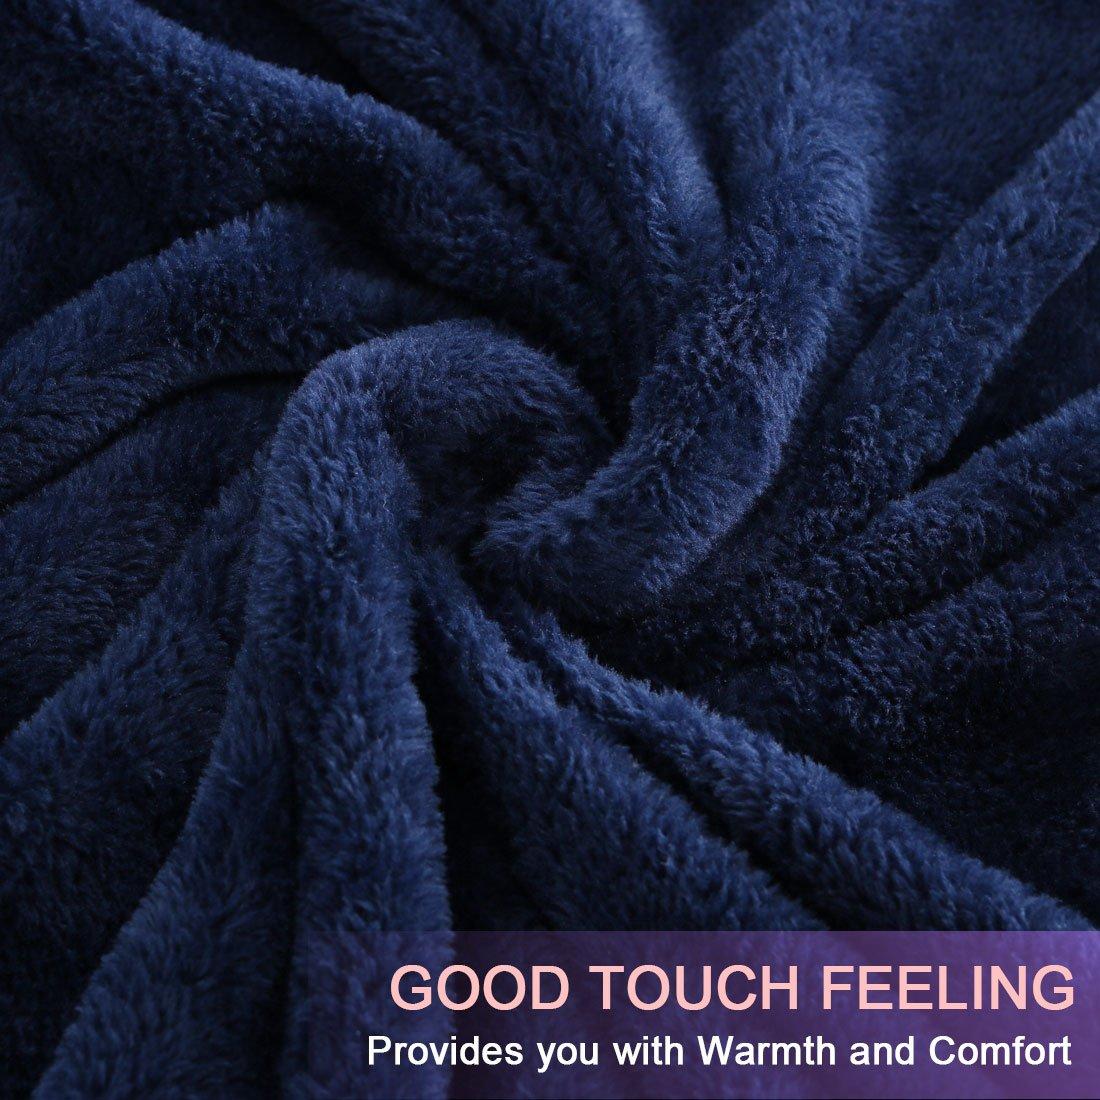 uxcell Flannel Fleece Blanket Super Soft Lightweight Warm Fuzzy Throw Couch Bed Blanket Light Pink 180cm x 200cm a17121500ux0266